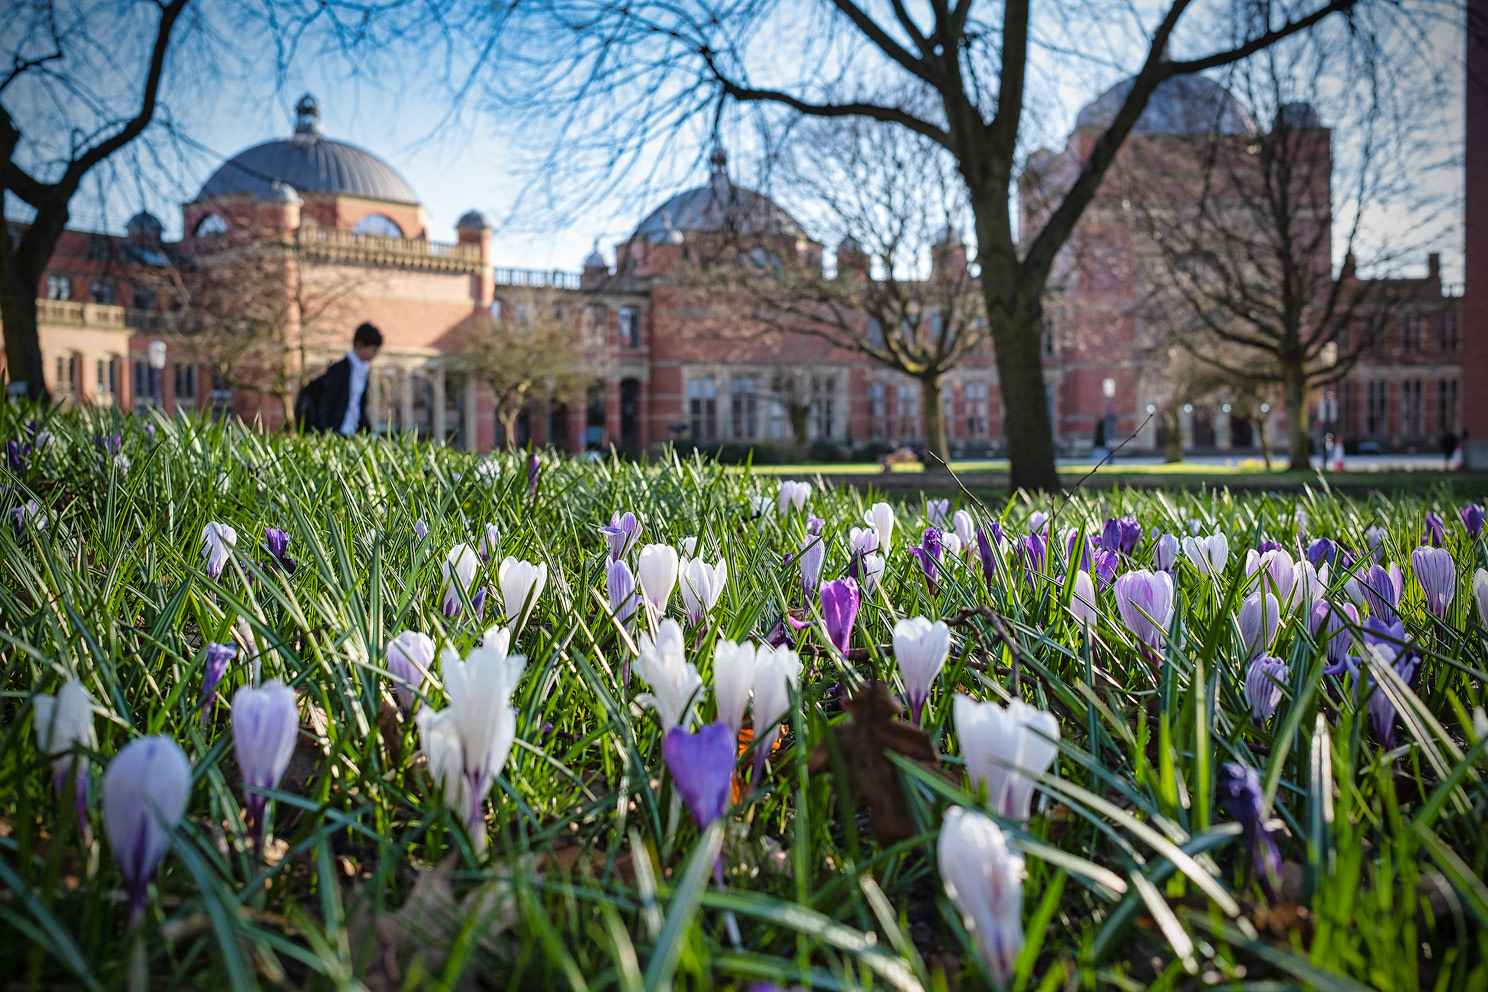 Spring 2021 on UoB Campus